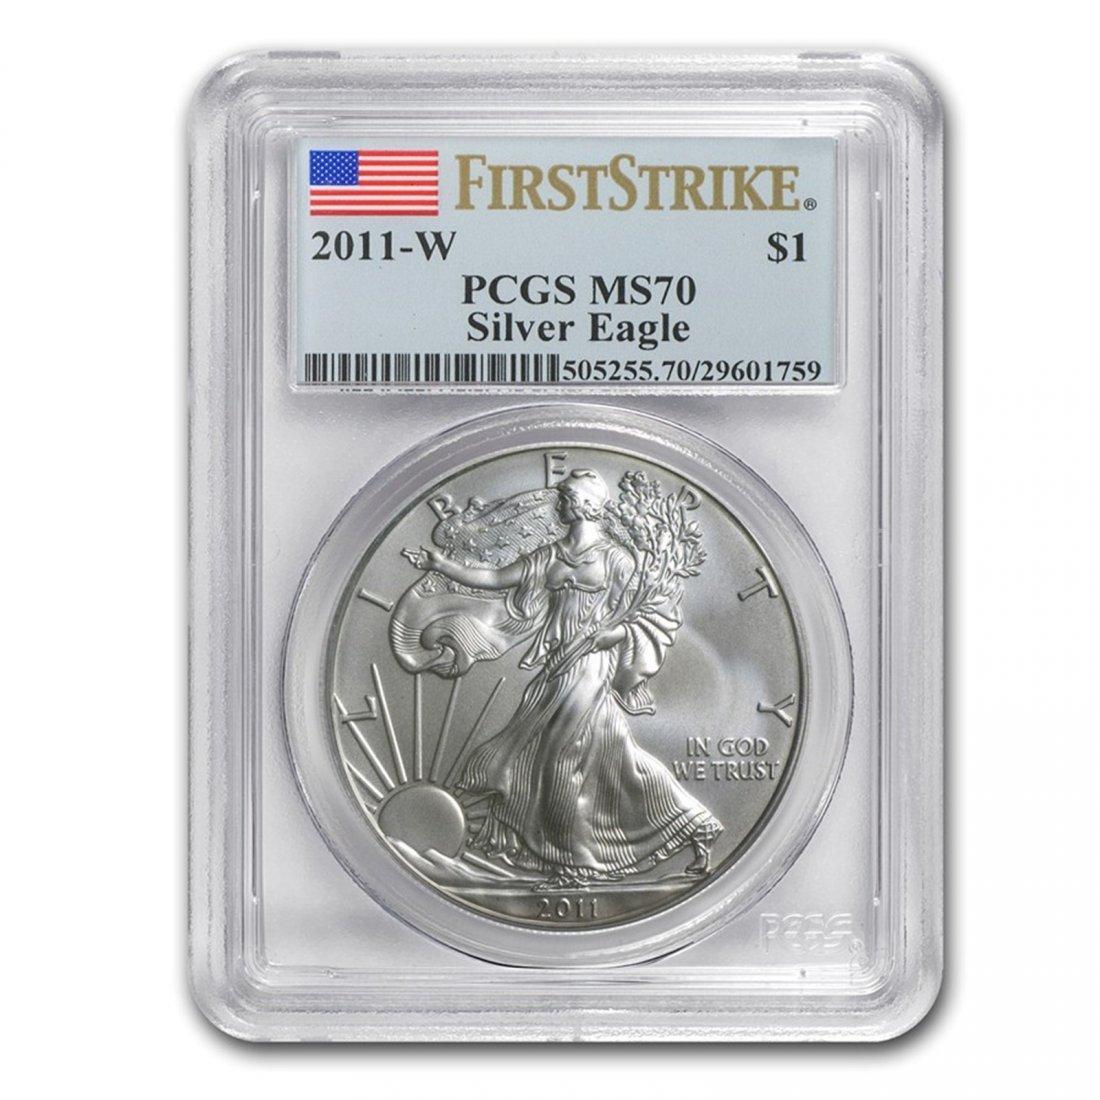 2011-W Burnished Silver American Eagle MS-70 PCGS (FS)